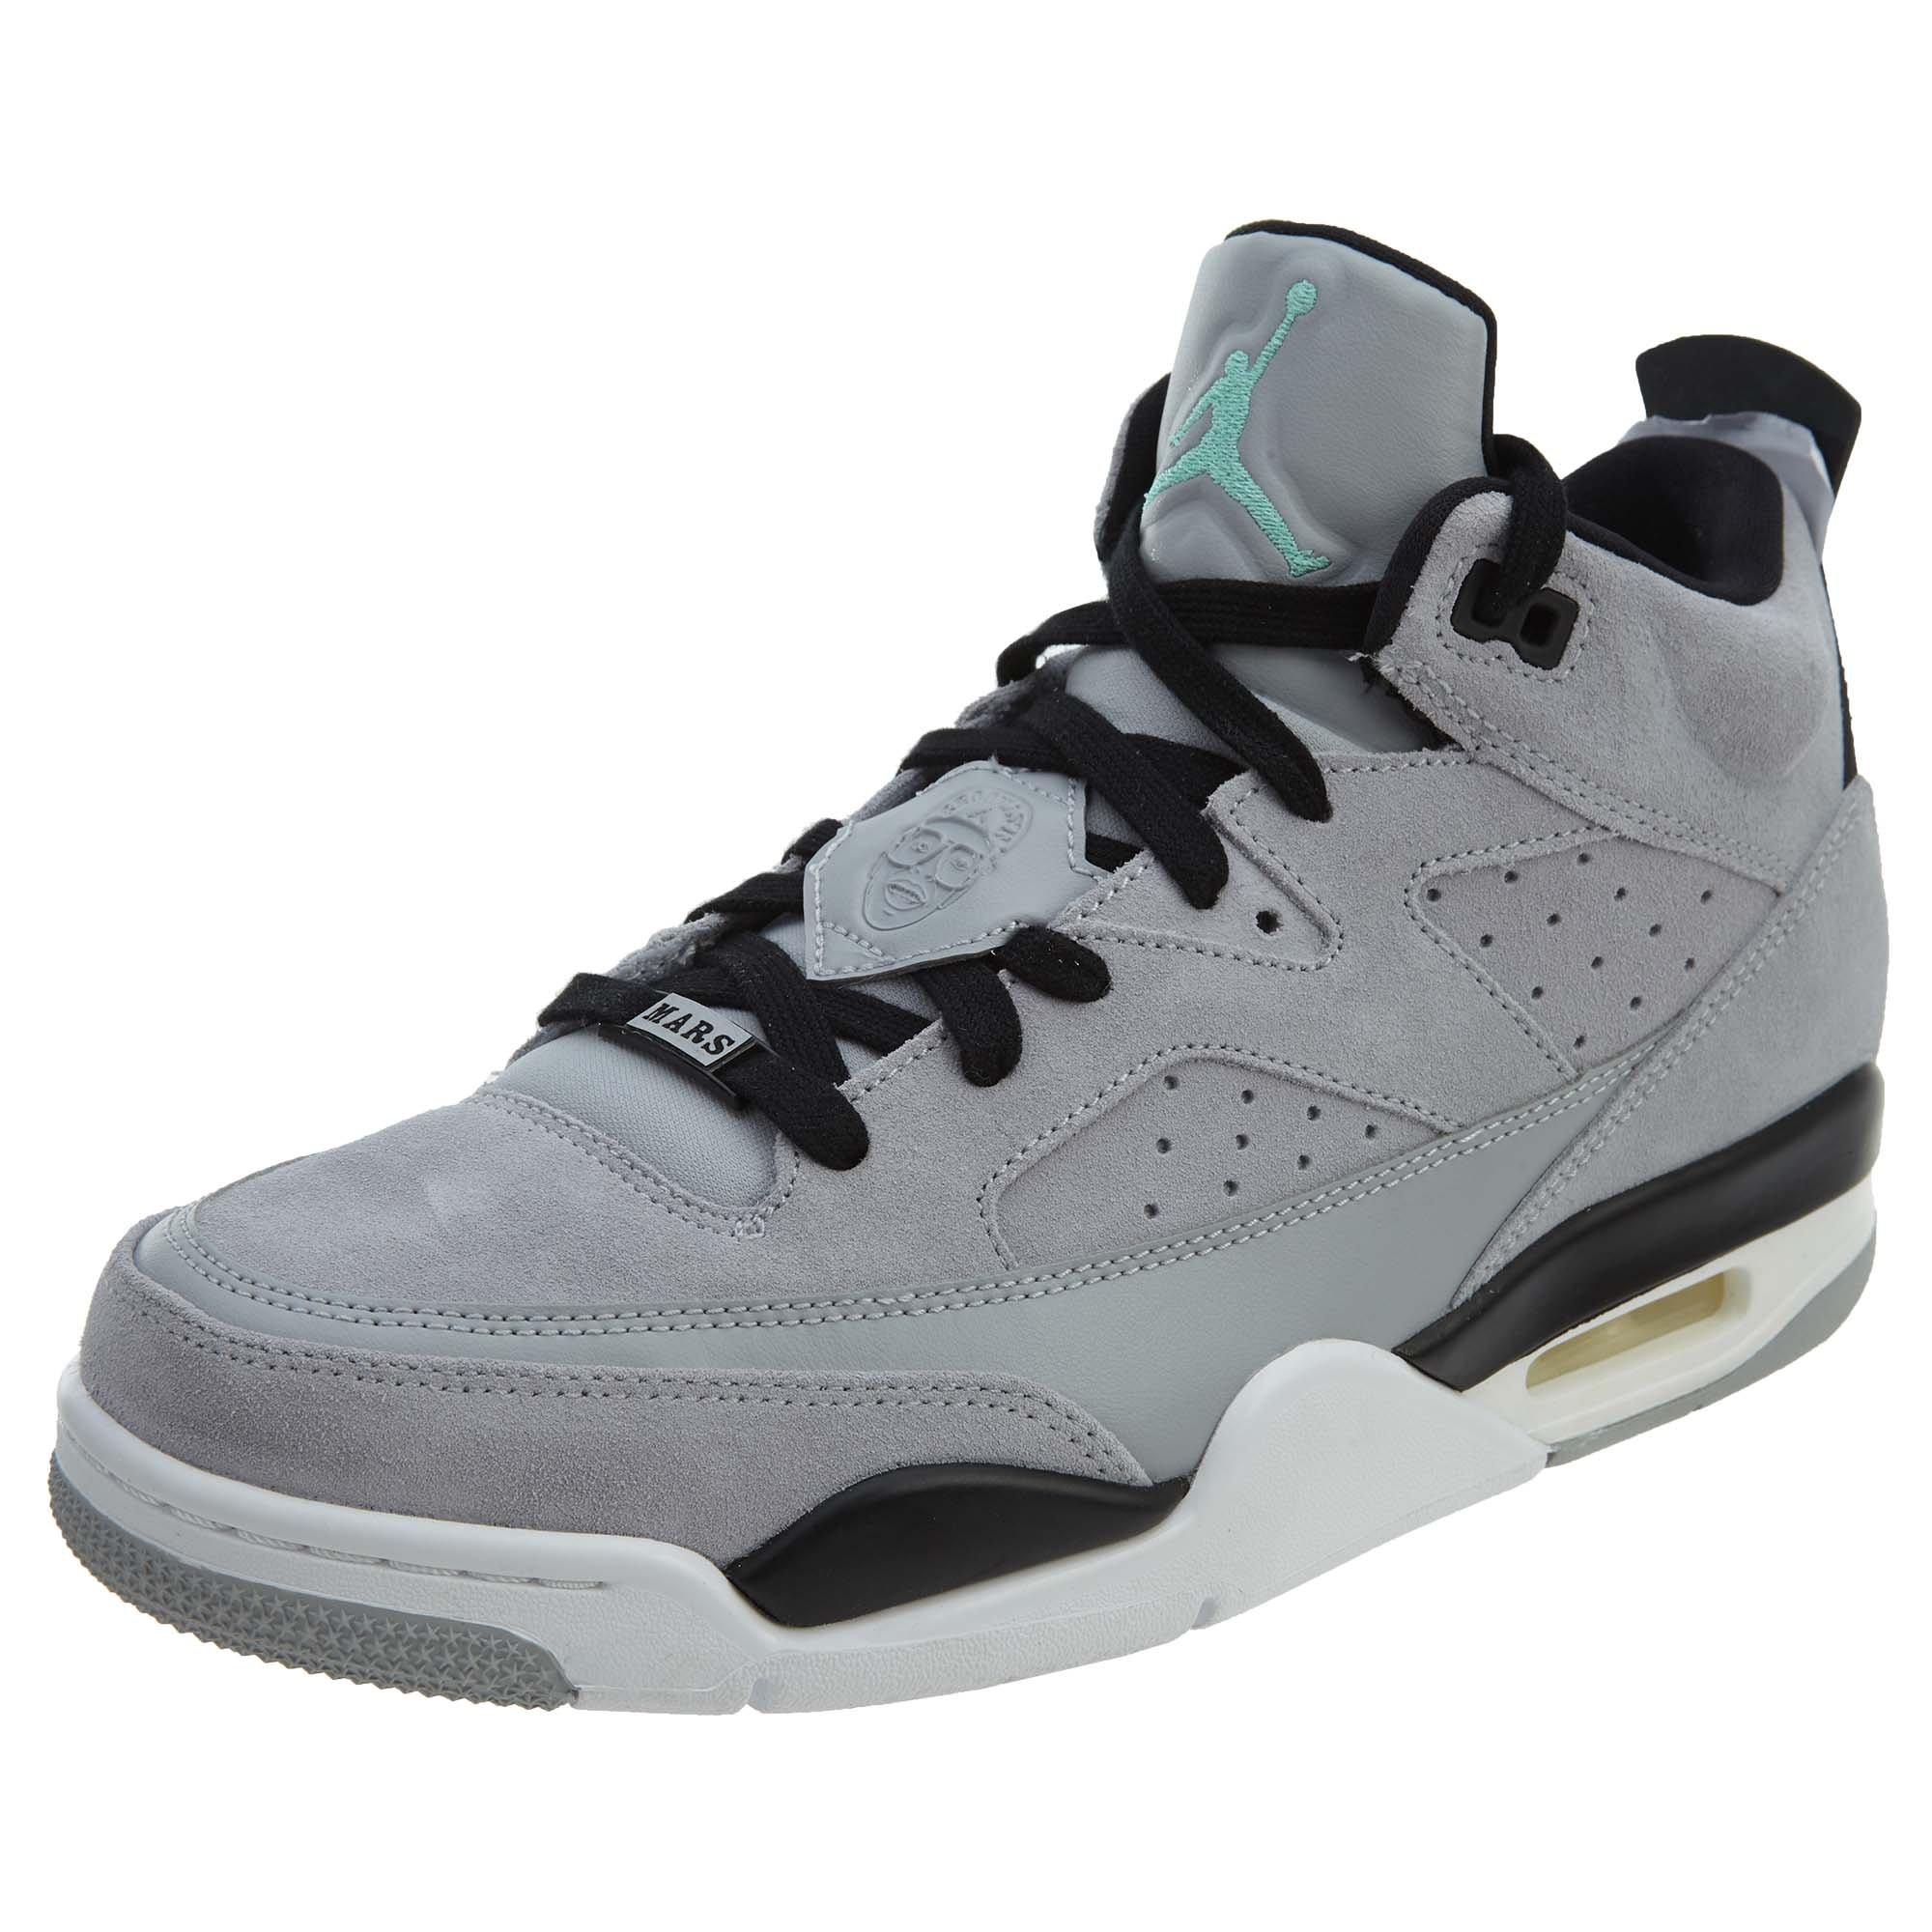 74270b1af269e9 Galleon - Nike Mens Air Jordan Son Of Mars Low Basketball Shoe (9)